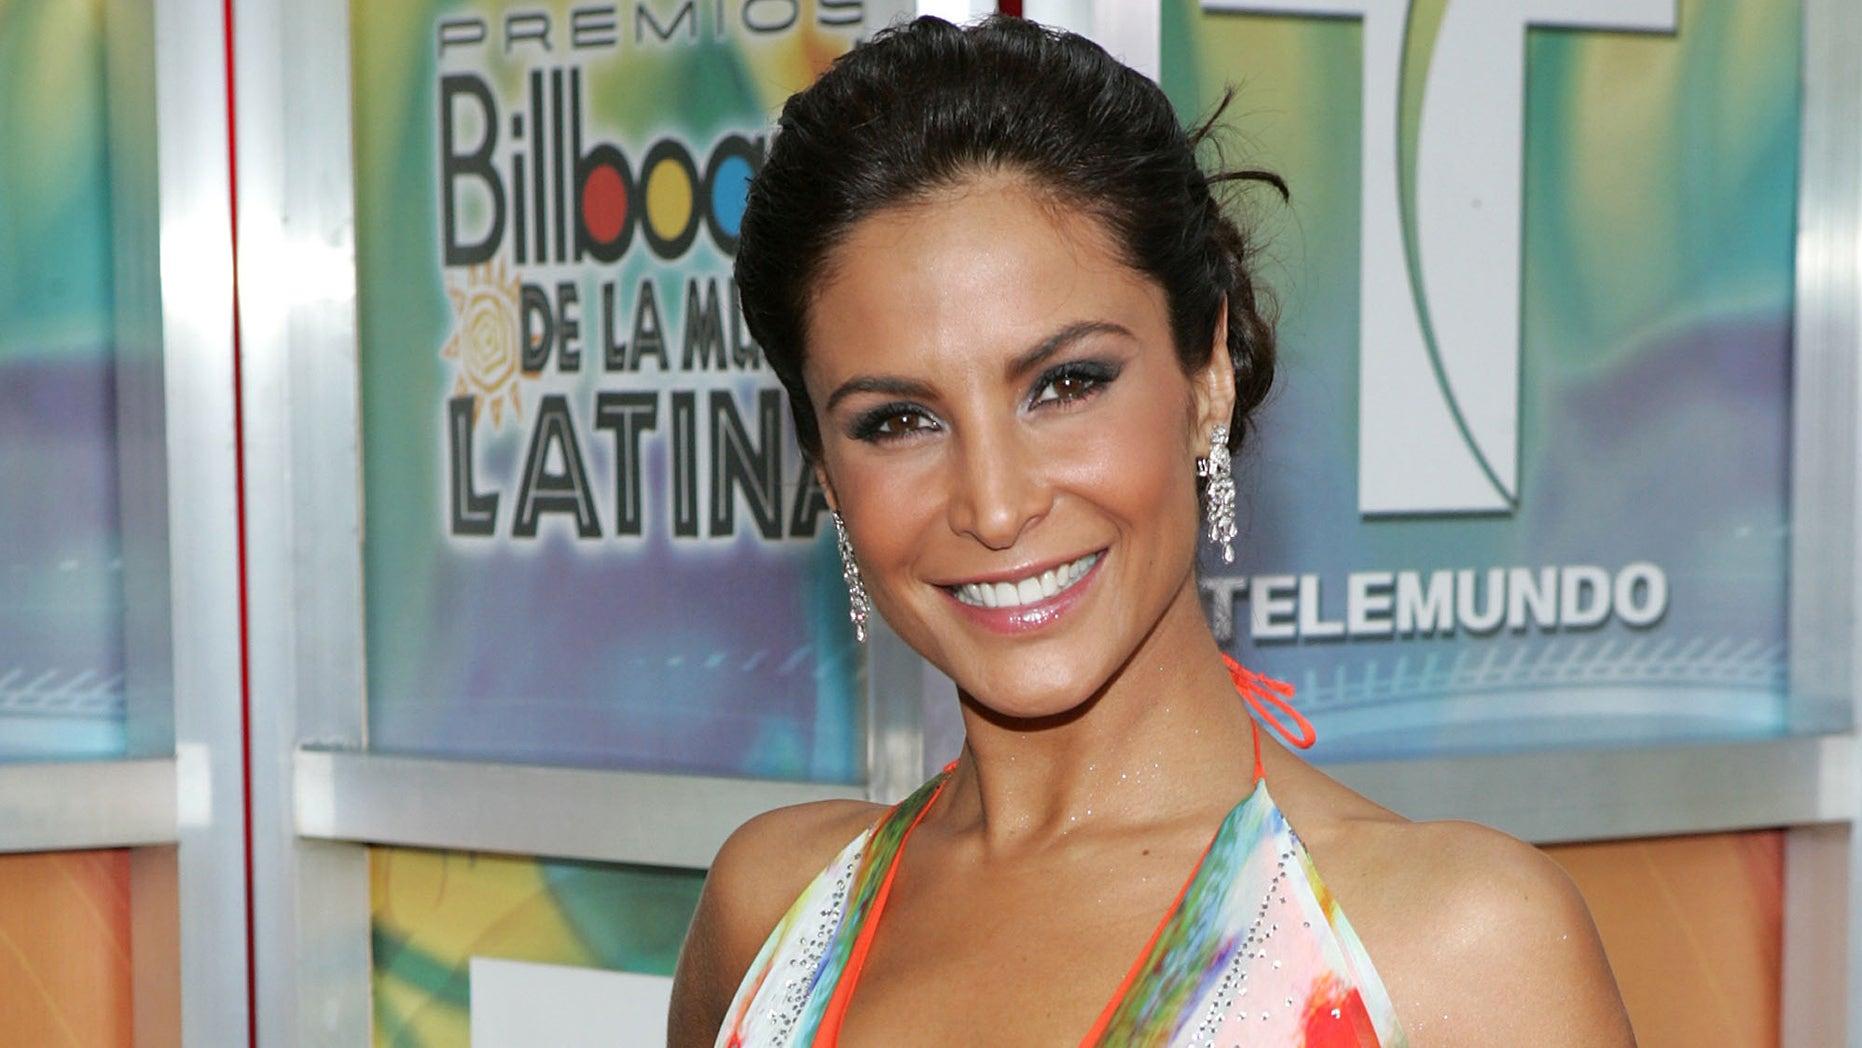 Lorena Rojas arrives at the 2005 Billboard Latin Music Awards on April 28, 2005 in Miami, Florida.